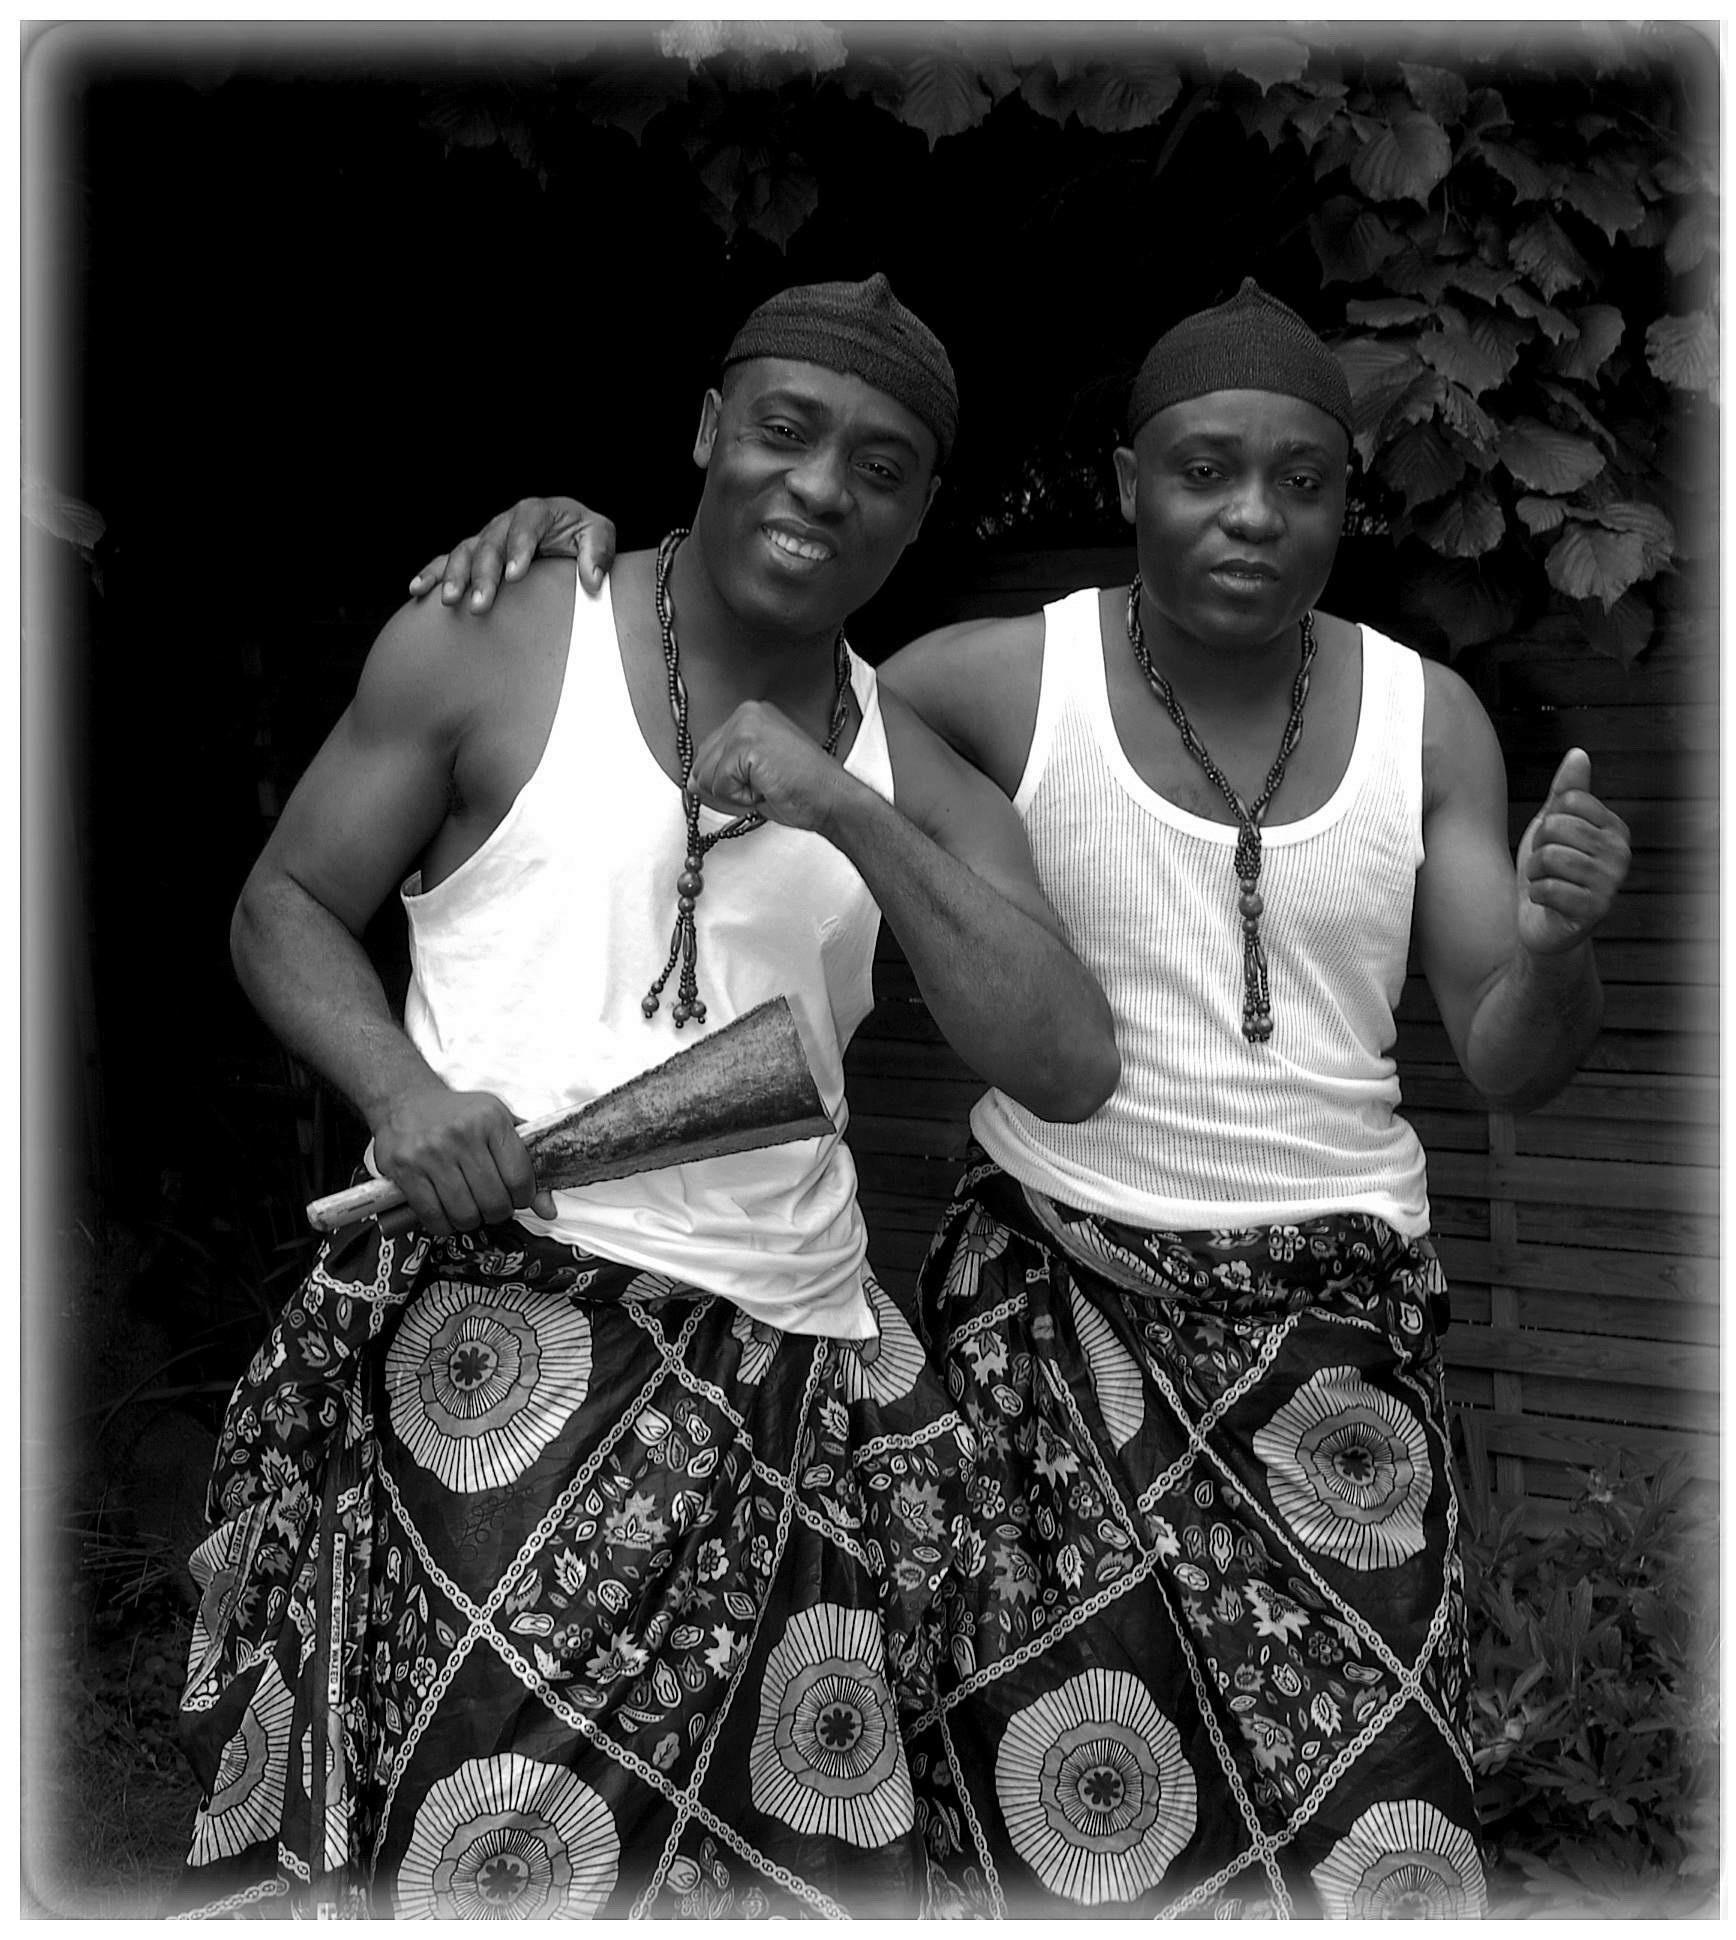 Les Jumeaux de MASAO (Masao Masu). Photo : Serge Lerus